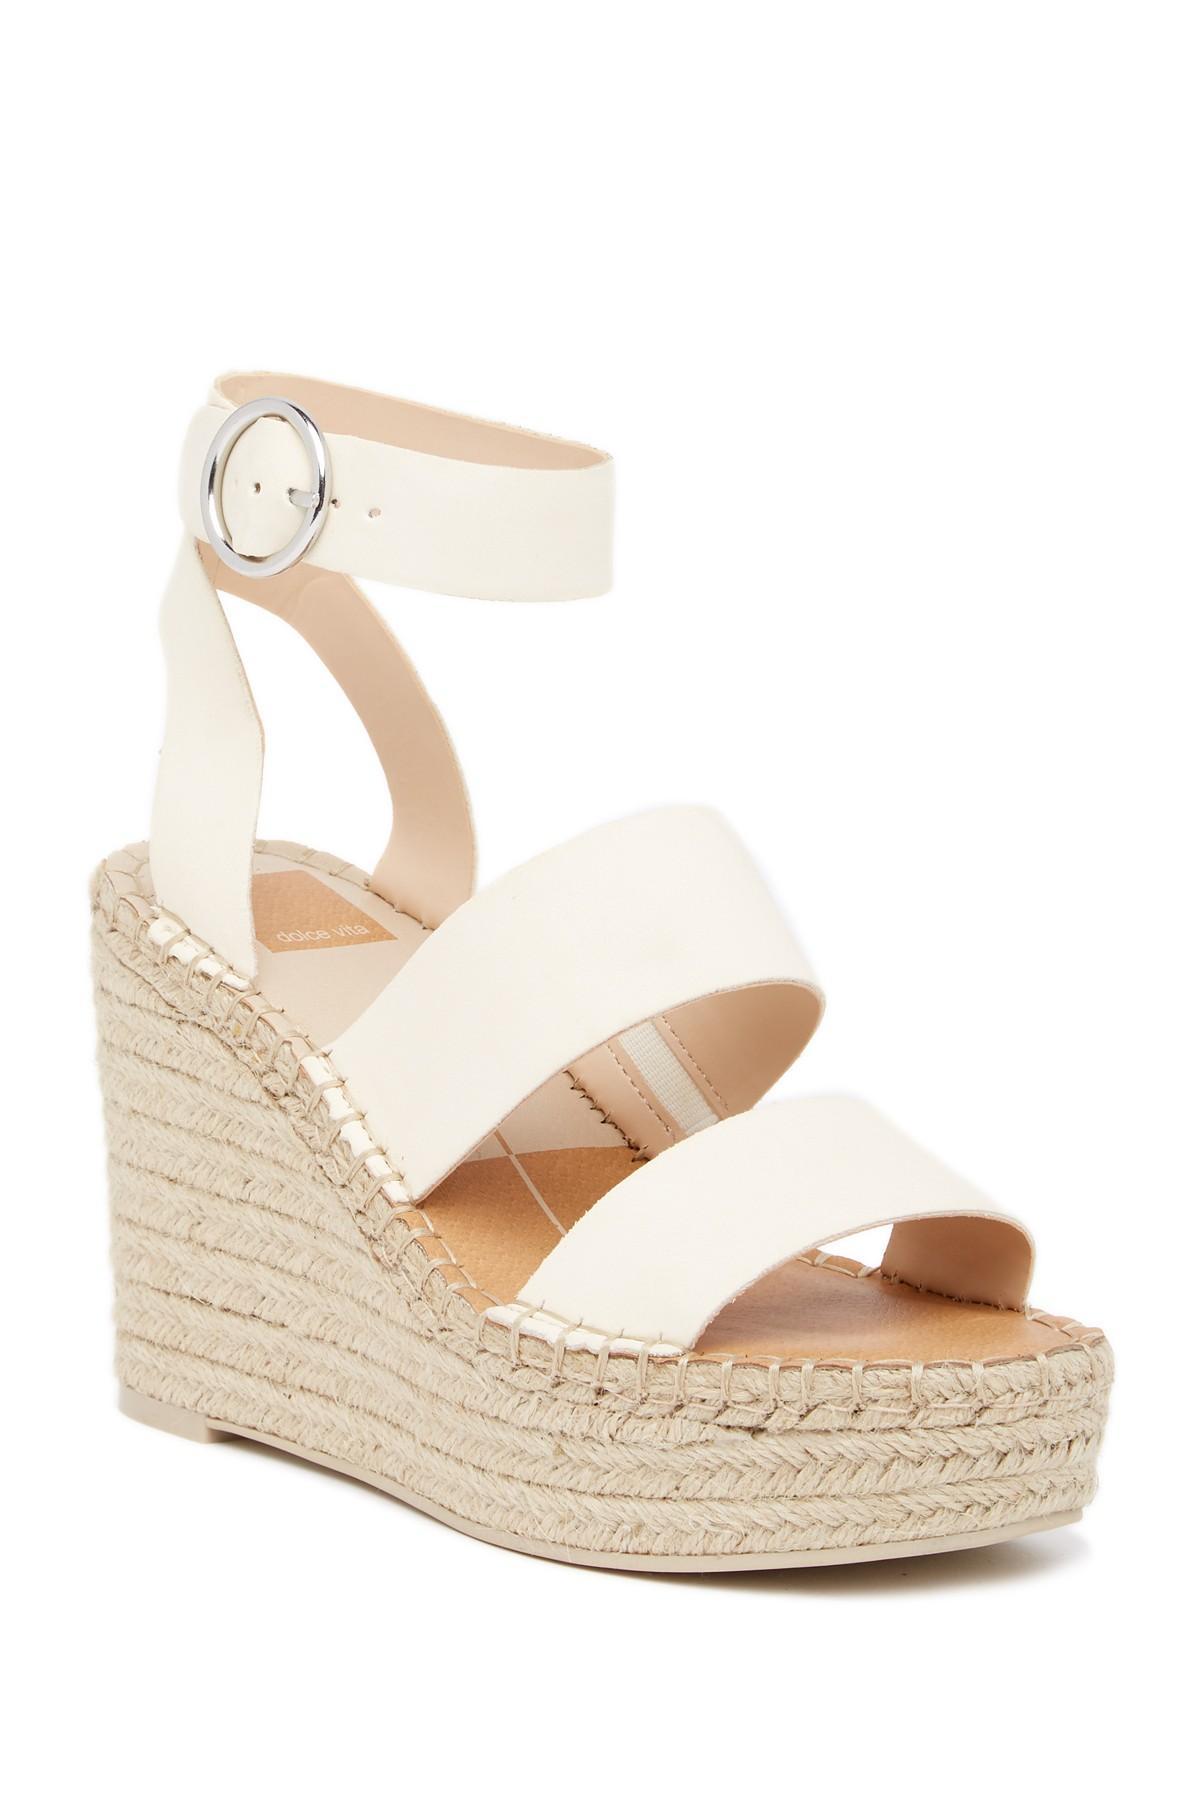 fdd71e71f54c Lyst - Dolce Vita Shaun Platform Espadrille Wedge Sandal in White